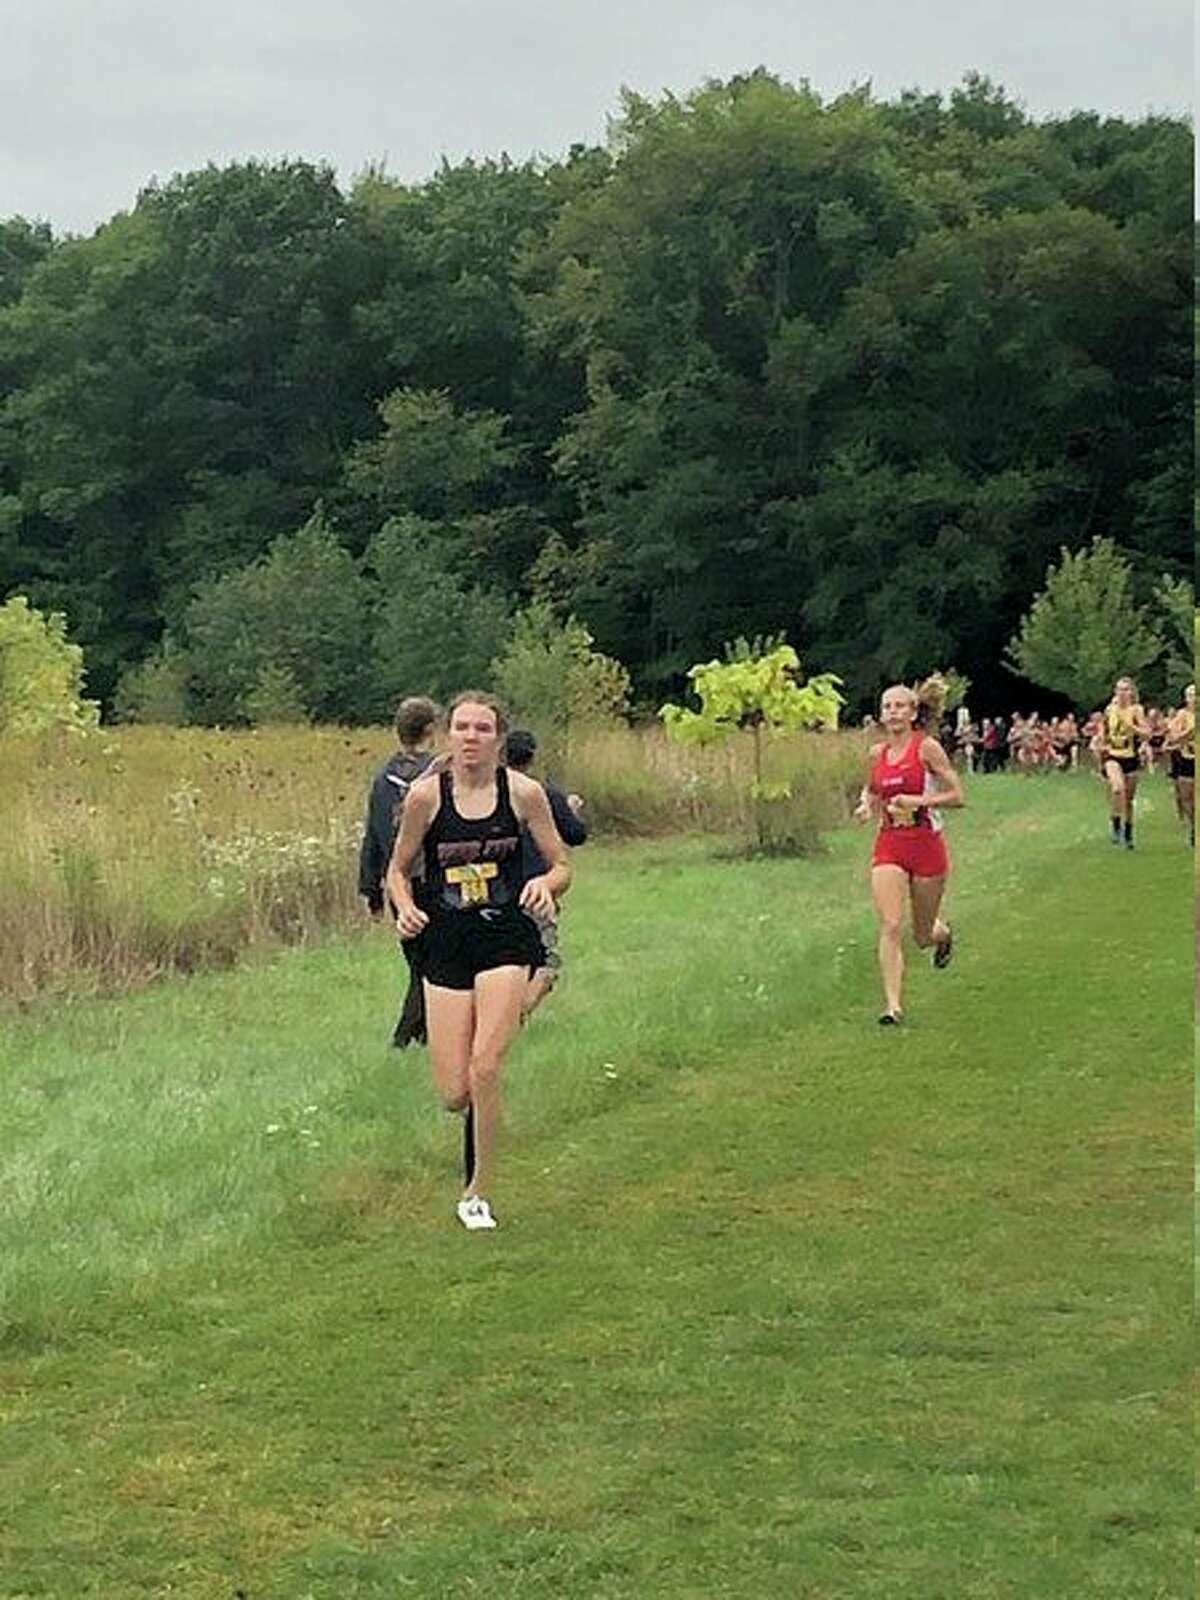 Abbi Kiaunis works her way through the course at Shepherd. (Herald Review photo)